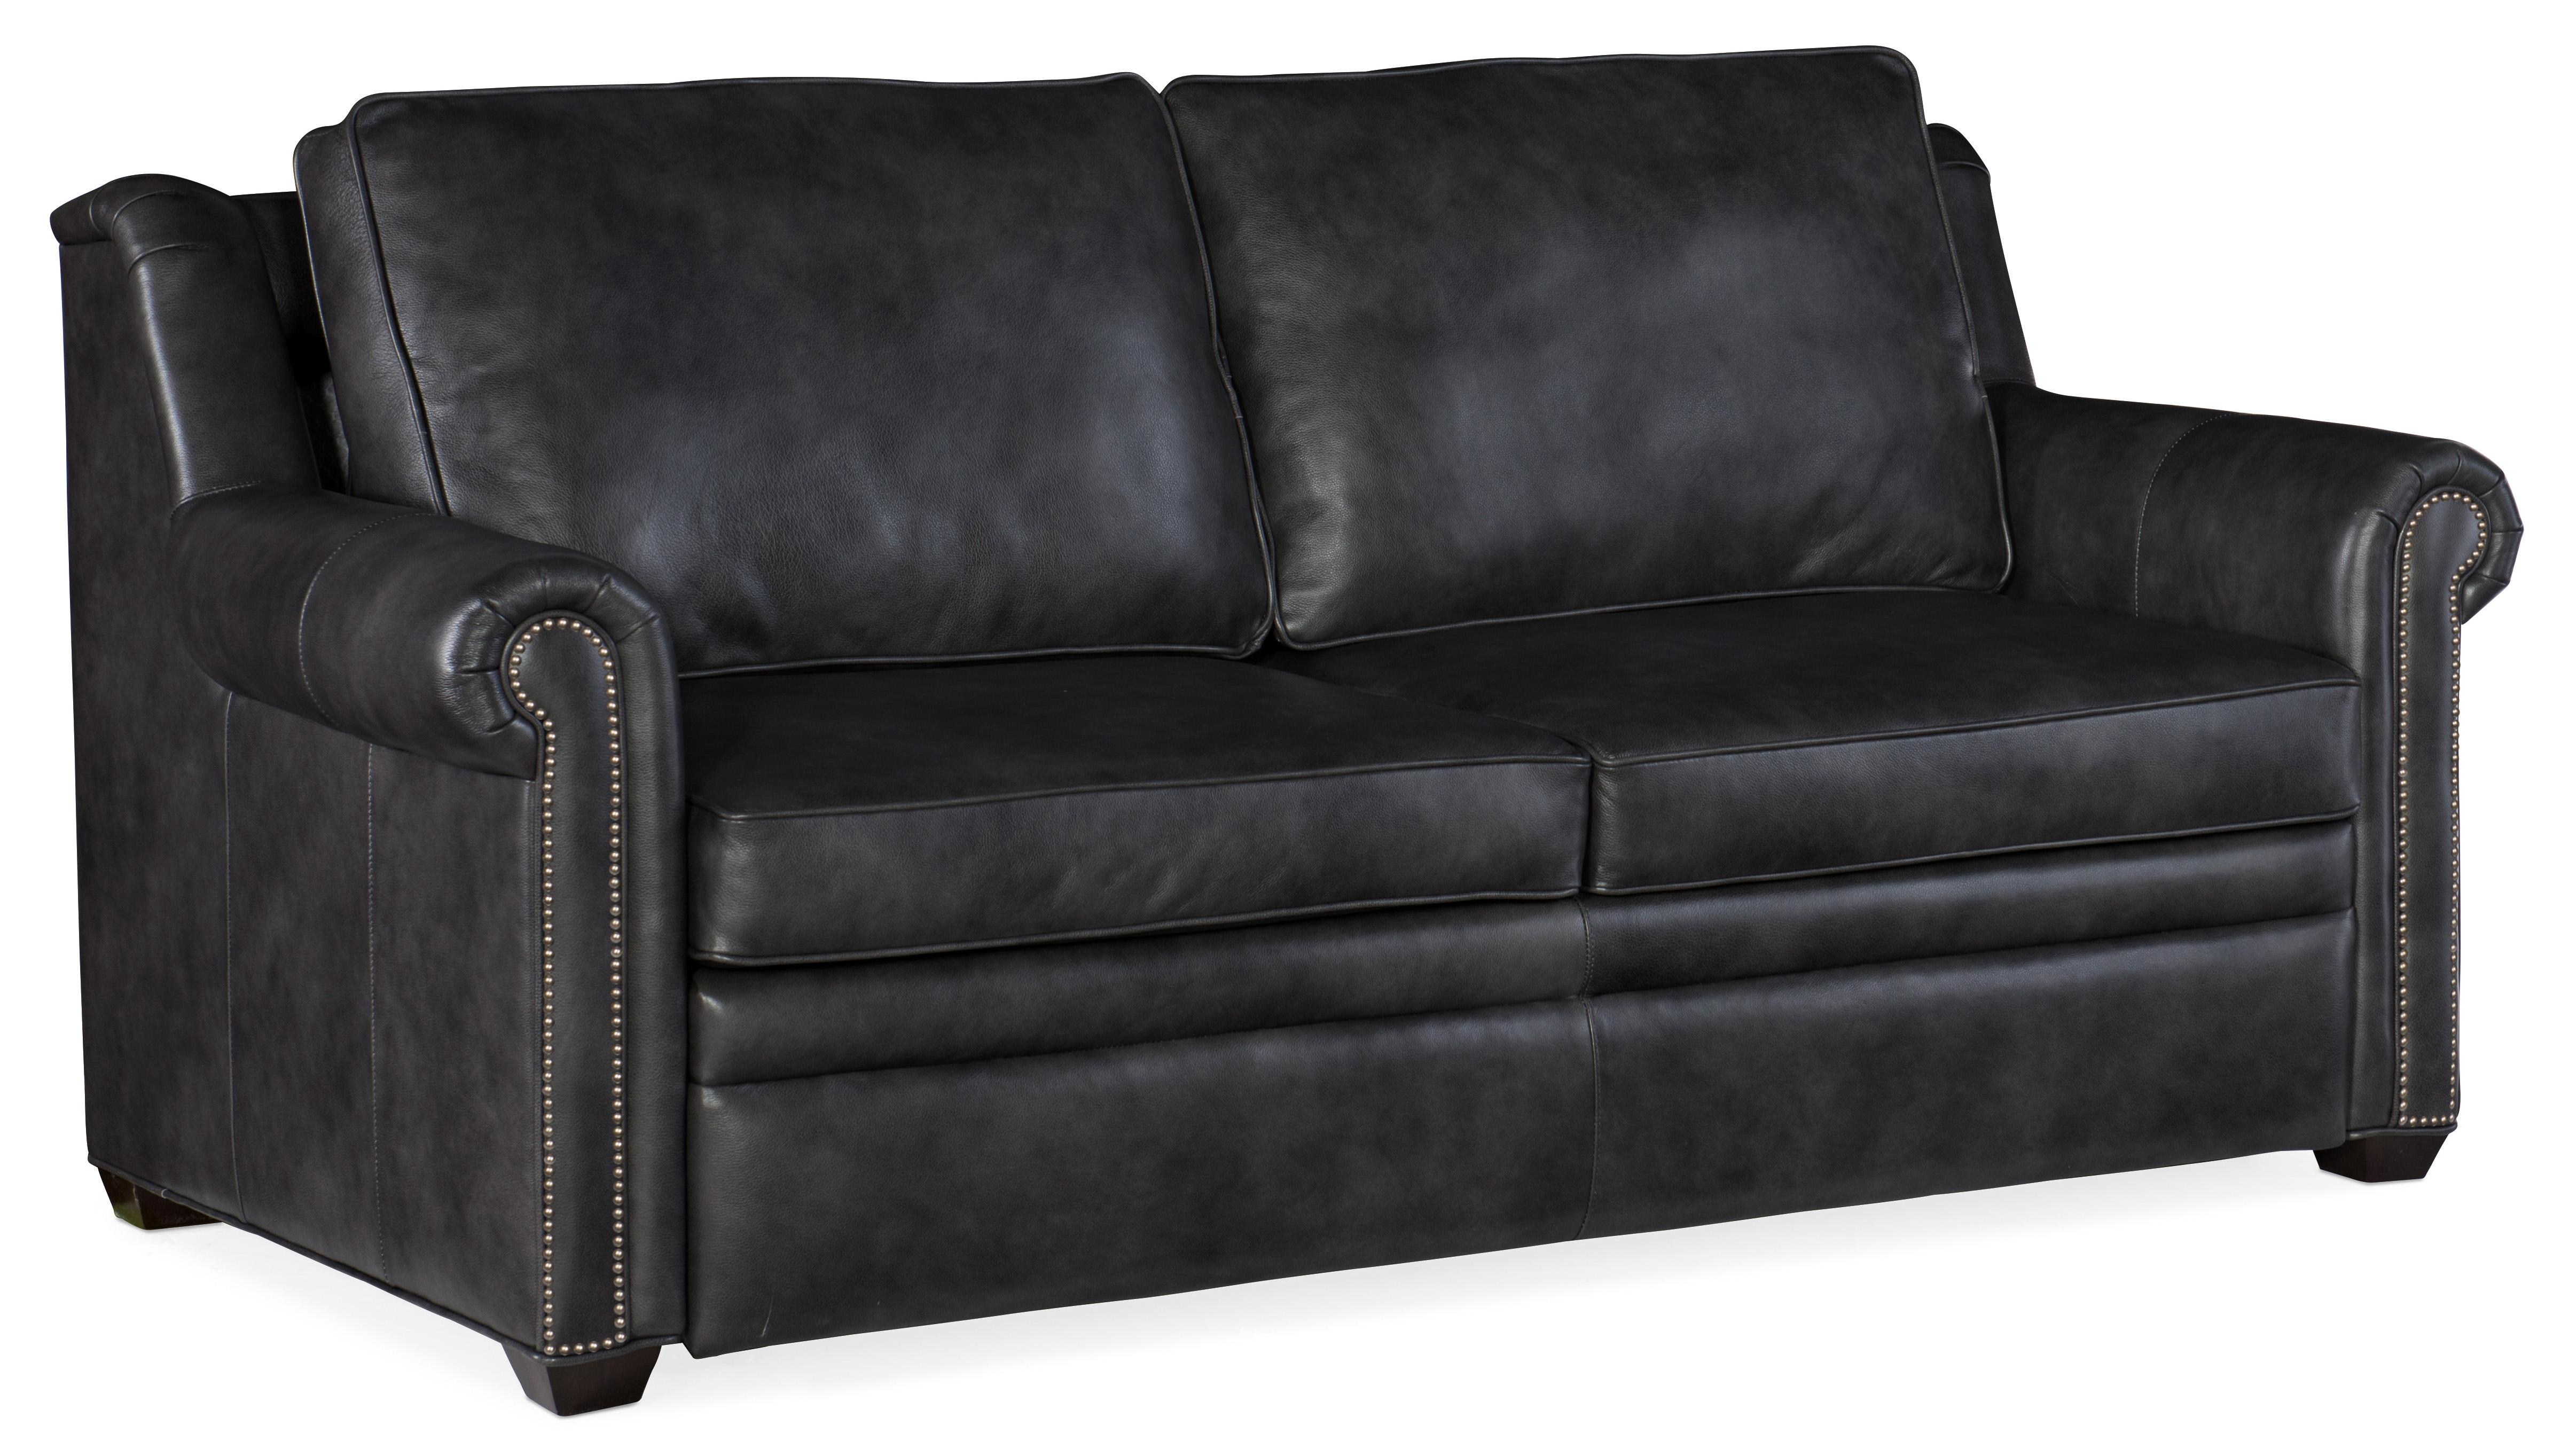 Reece Queen Power Sleep Sofa by Bradington Young at Mueller Furniture